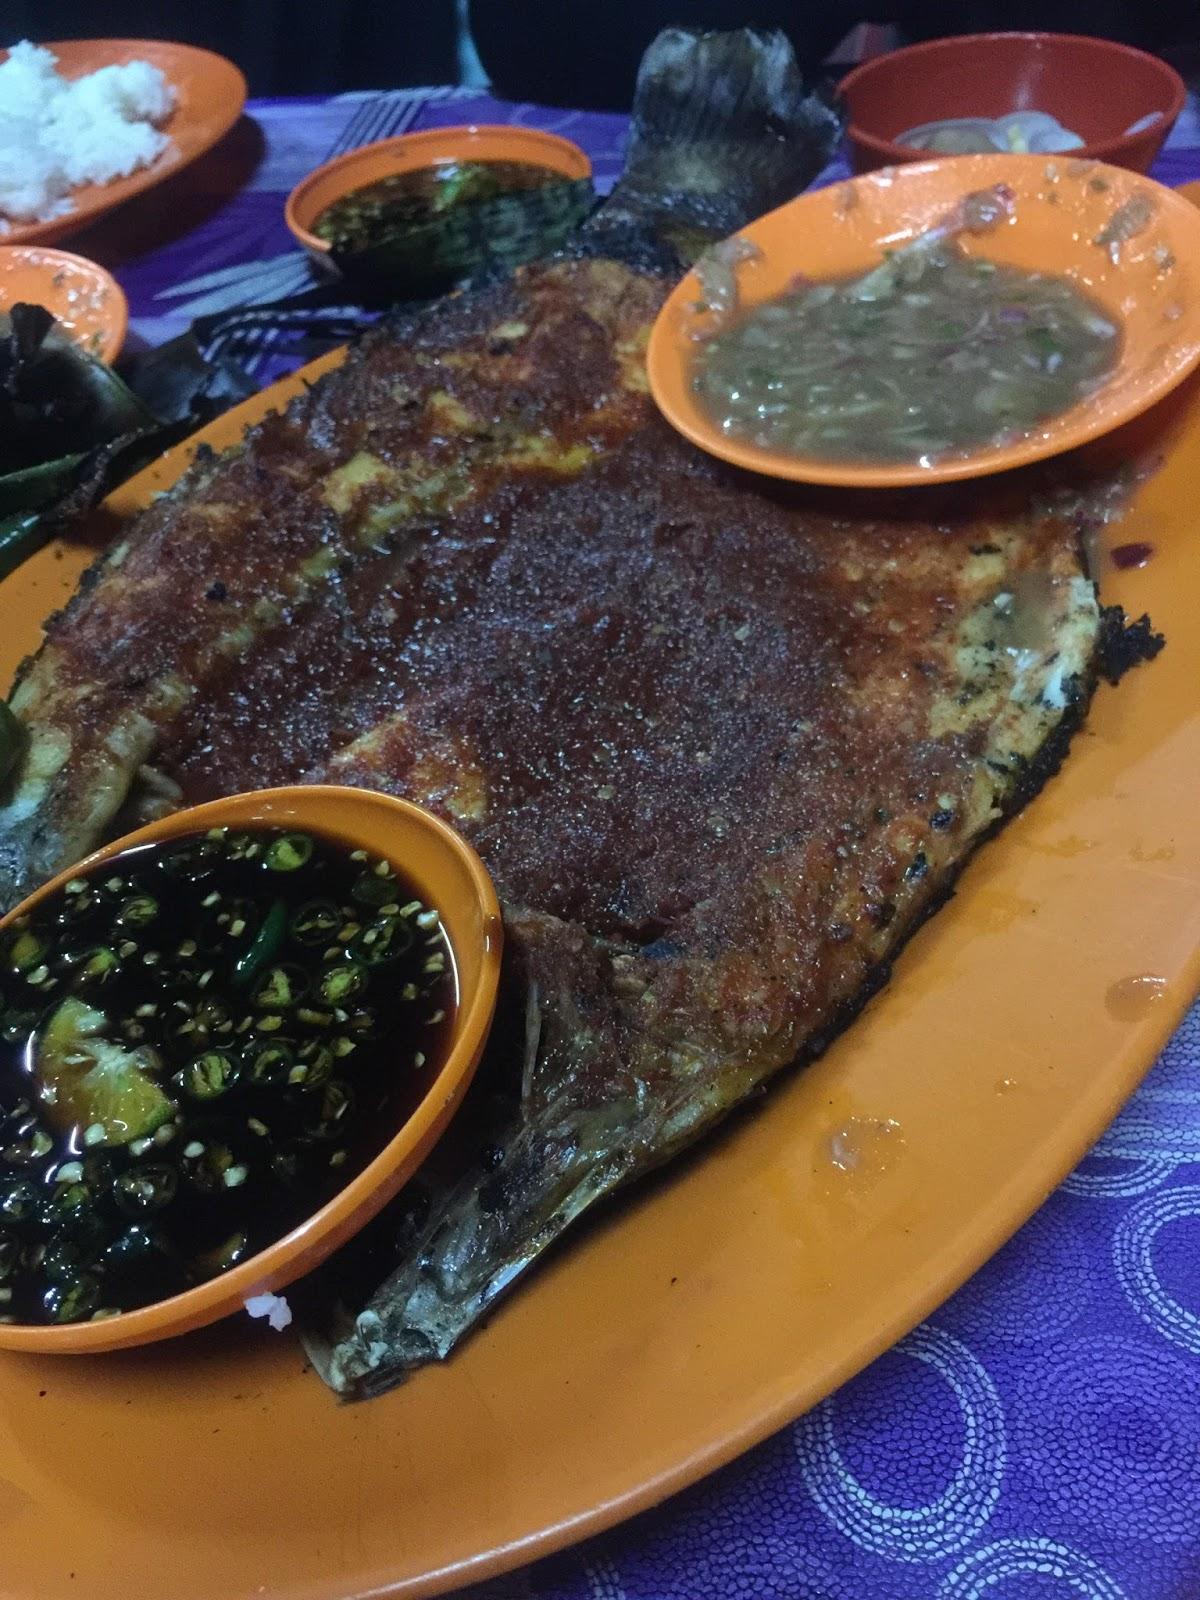 ikan bakar sedap, tempat makan menarik di pulau pinang, teluk tempoyak